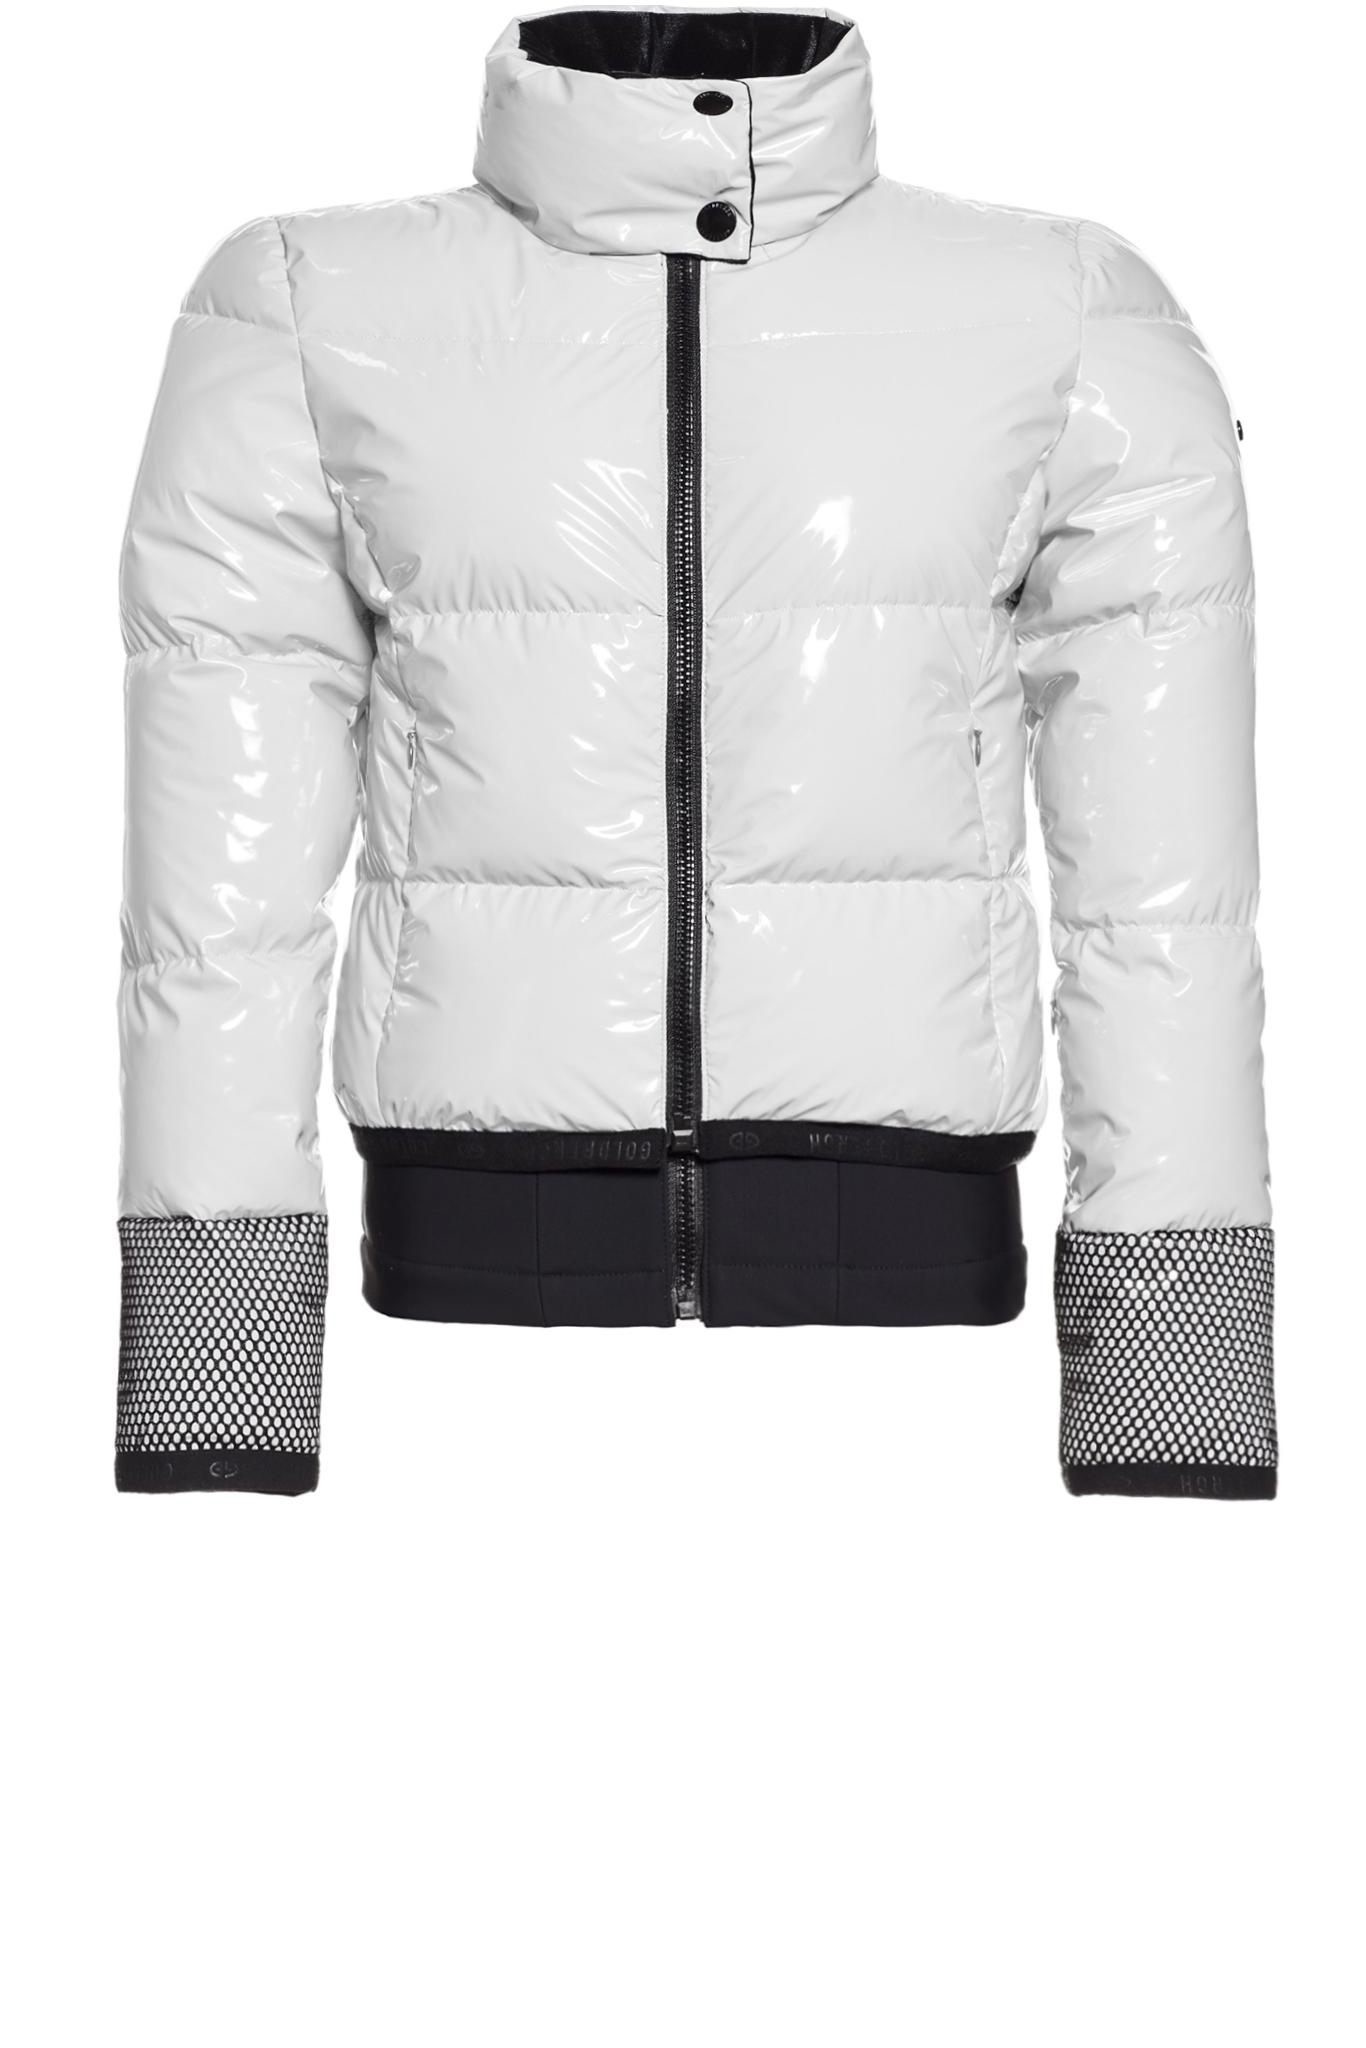 Goldbergh ski jas uitverkoop Dames Jassen   KLEDING.nl